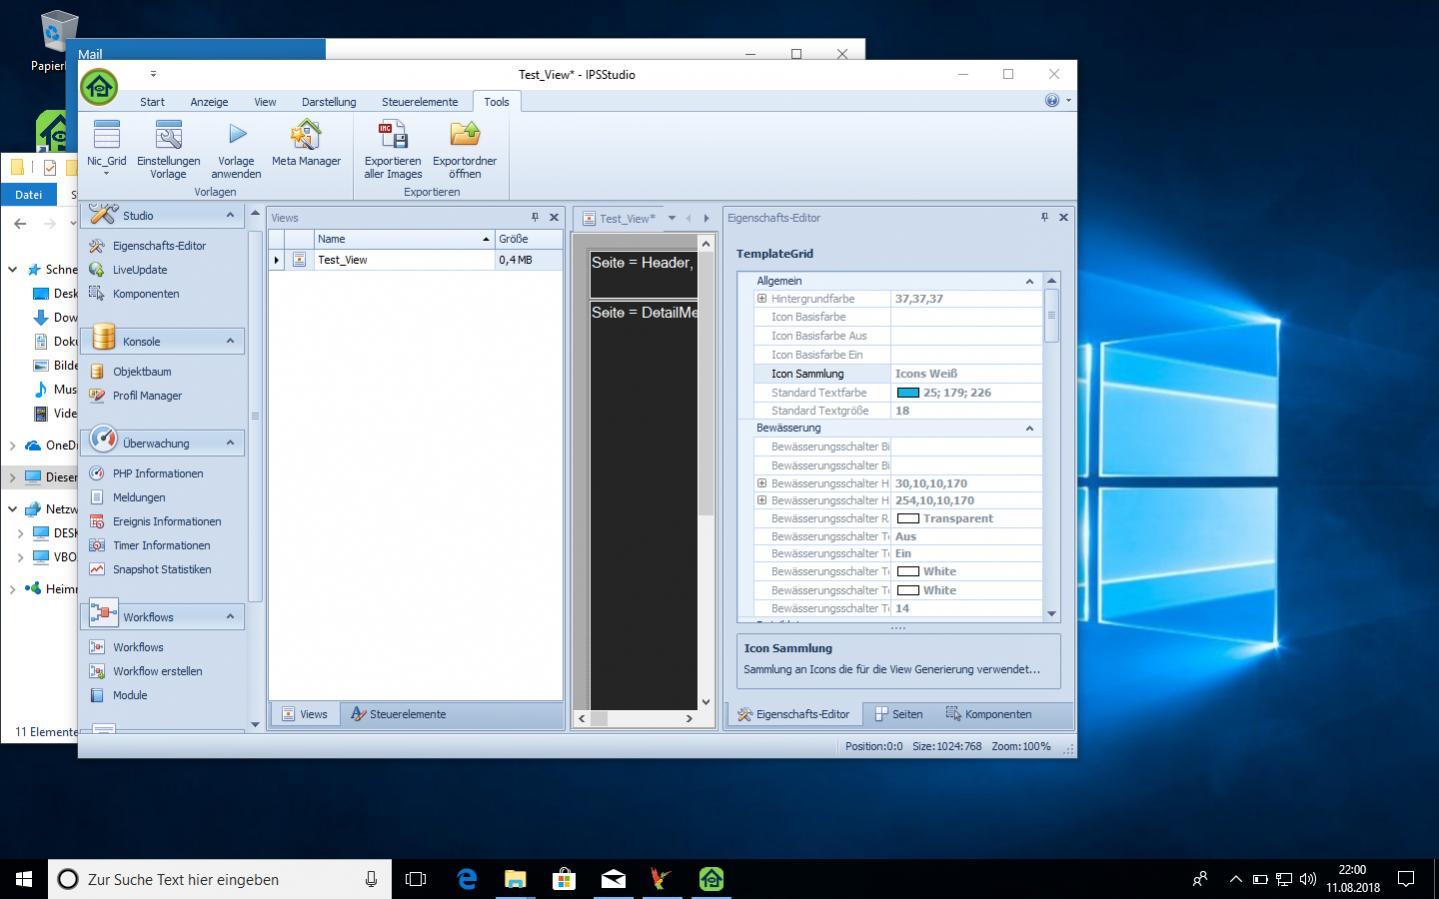 VirtualBox_Win10_11_08_2018_22_00_30.jpg